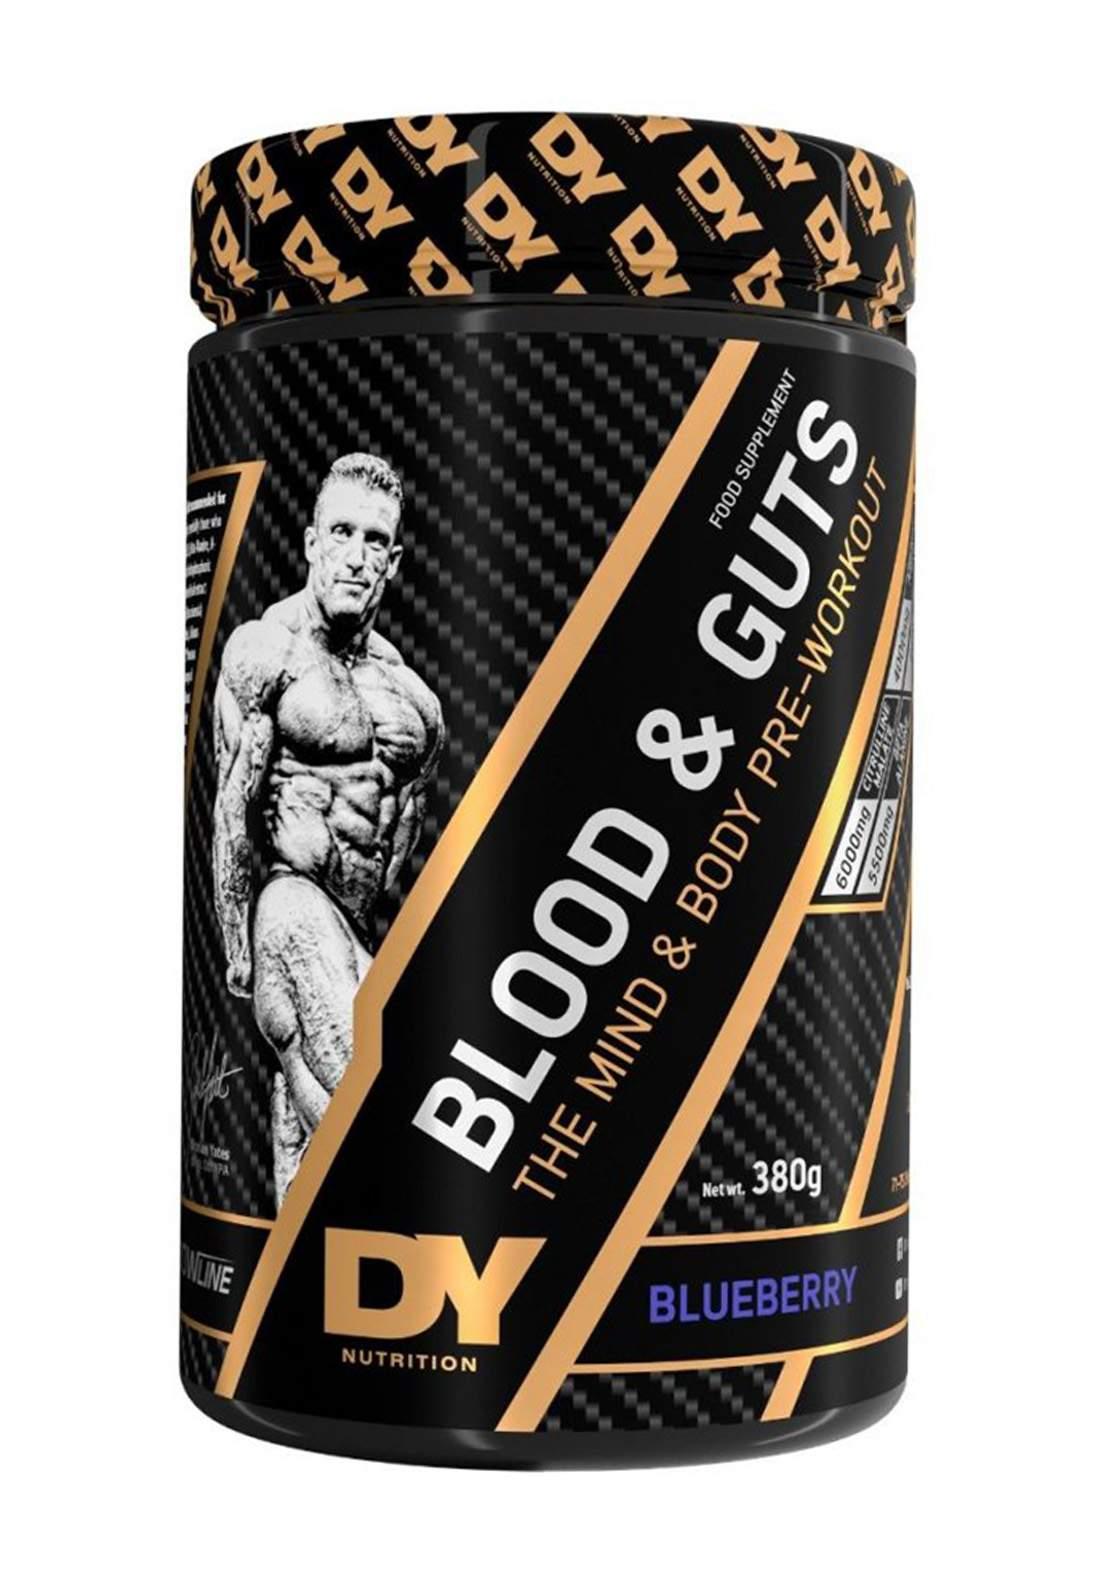 Dy Nutrition Blood And Guts Blurberry Flavor 380g مكمل غذائي بنكهة التوت الأزرق